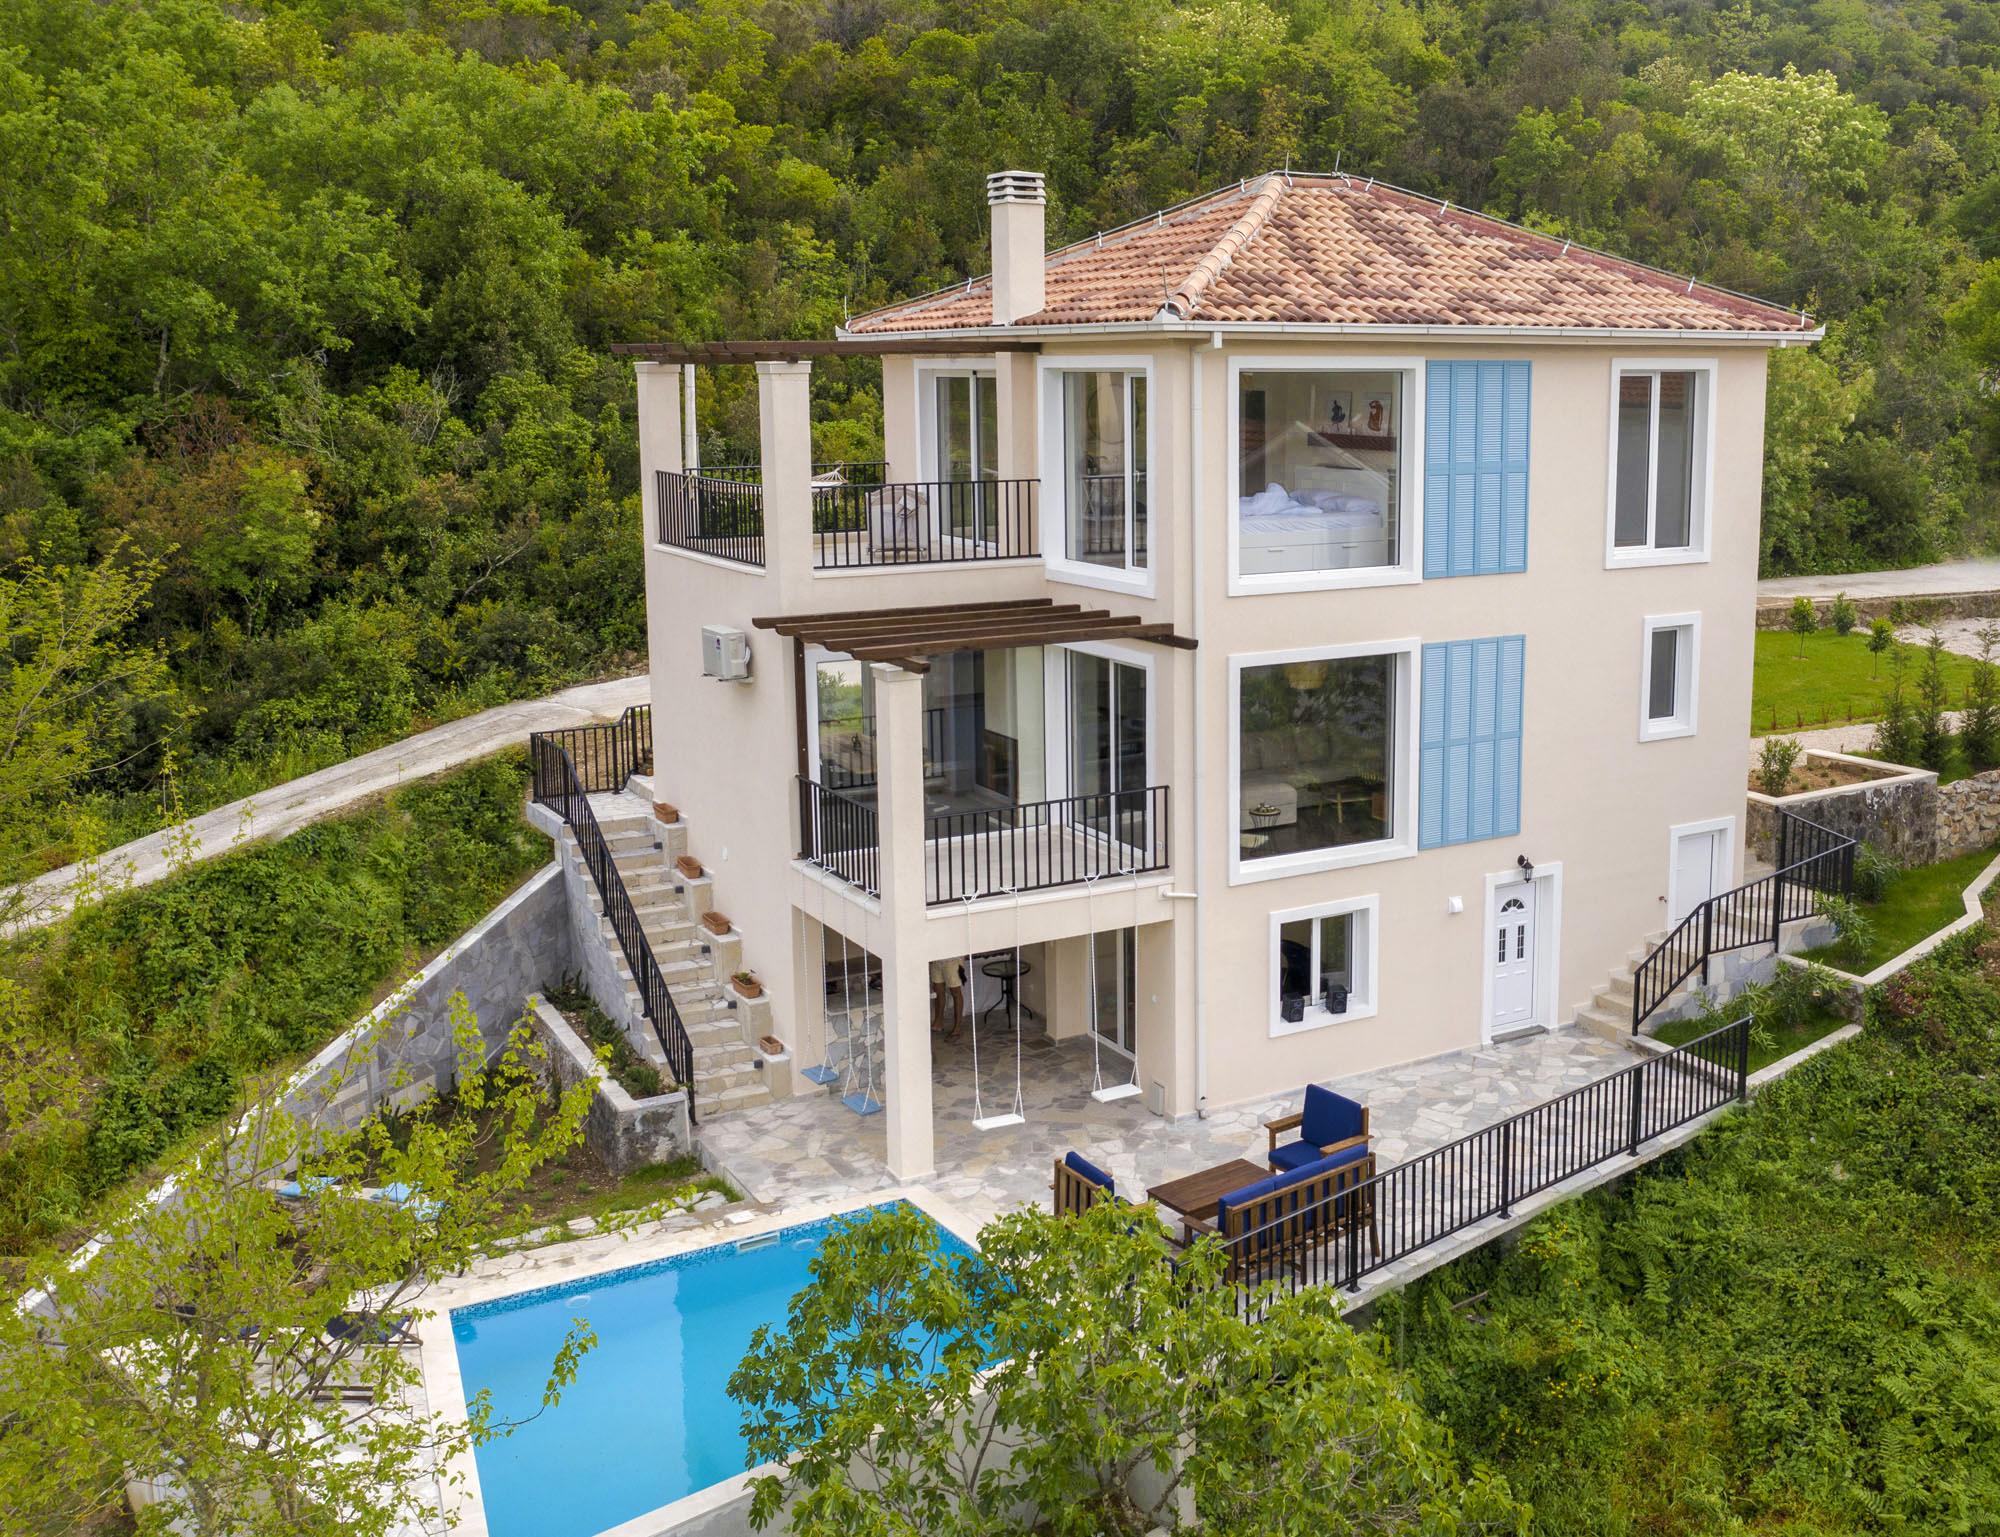 Тиват, Белила — новая трехэтажная вилла с видом на море